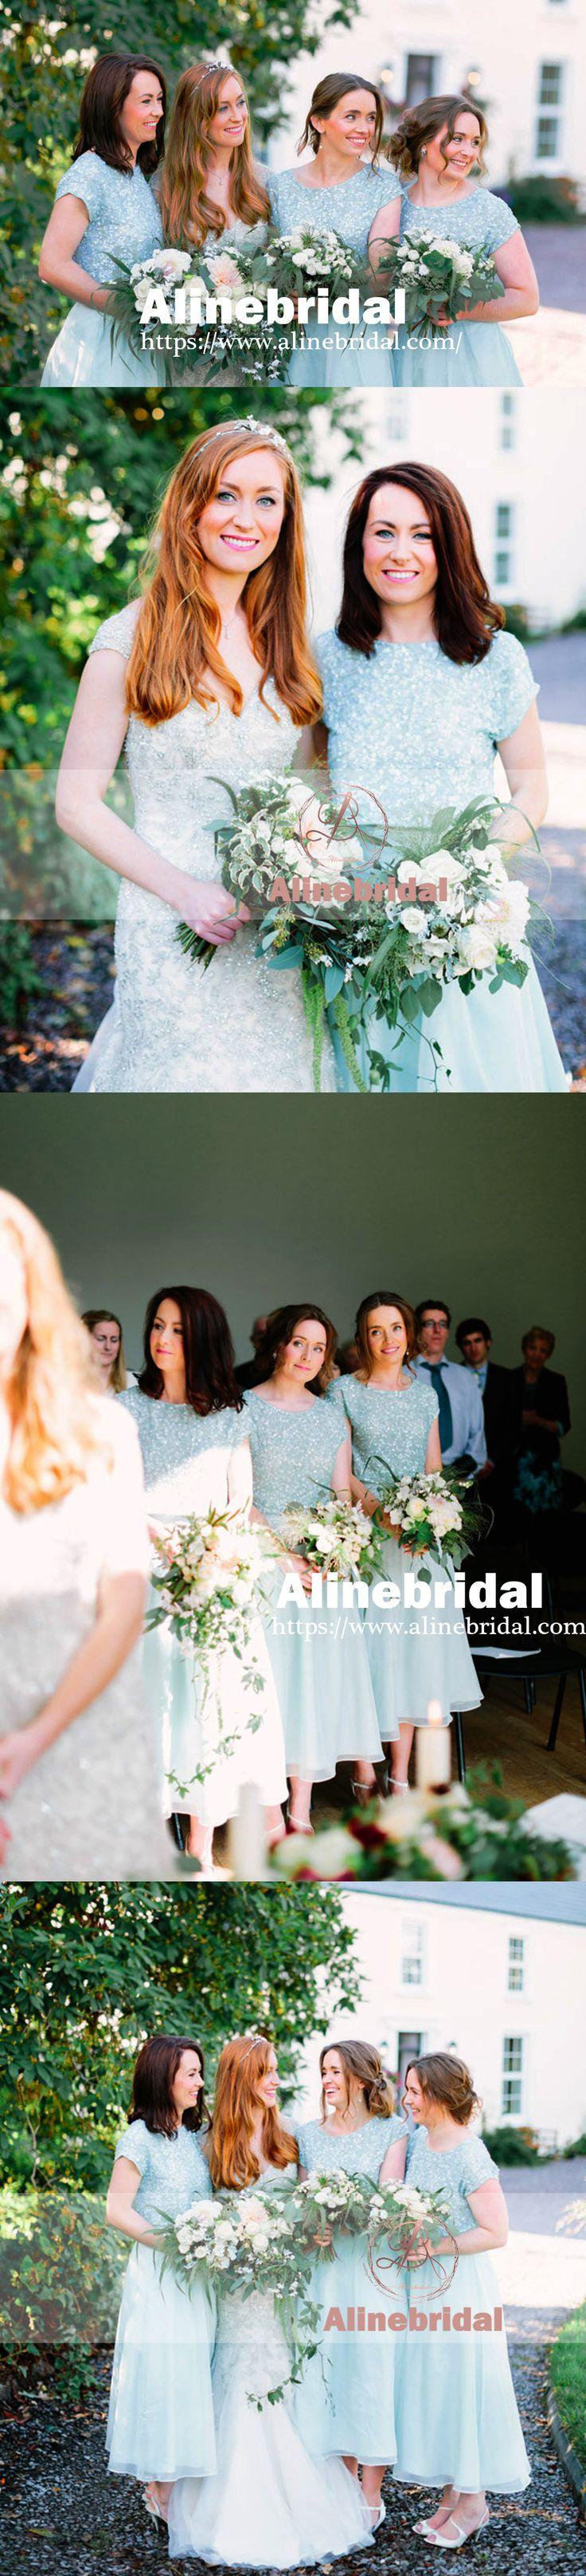 SPARKLY SEQUINS LIGHT BLUE CHIFFON ROUND NECK SHORT SLEEVE ANKLE-LENGTH BRIDESMAID DRESSES. AB1196